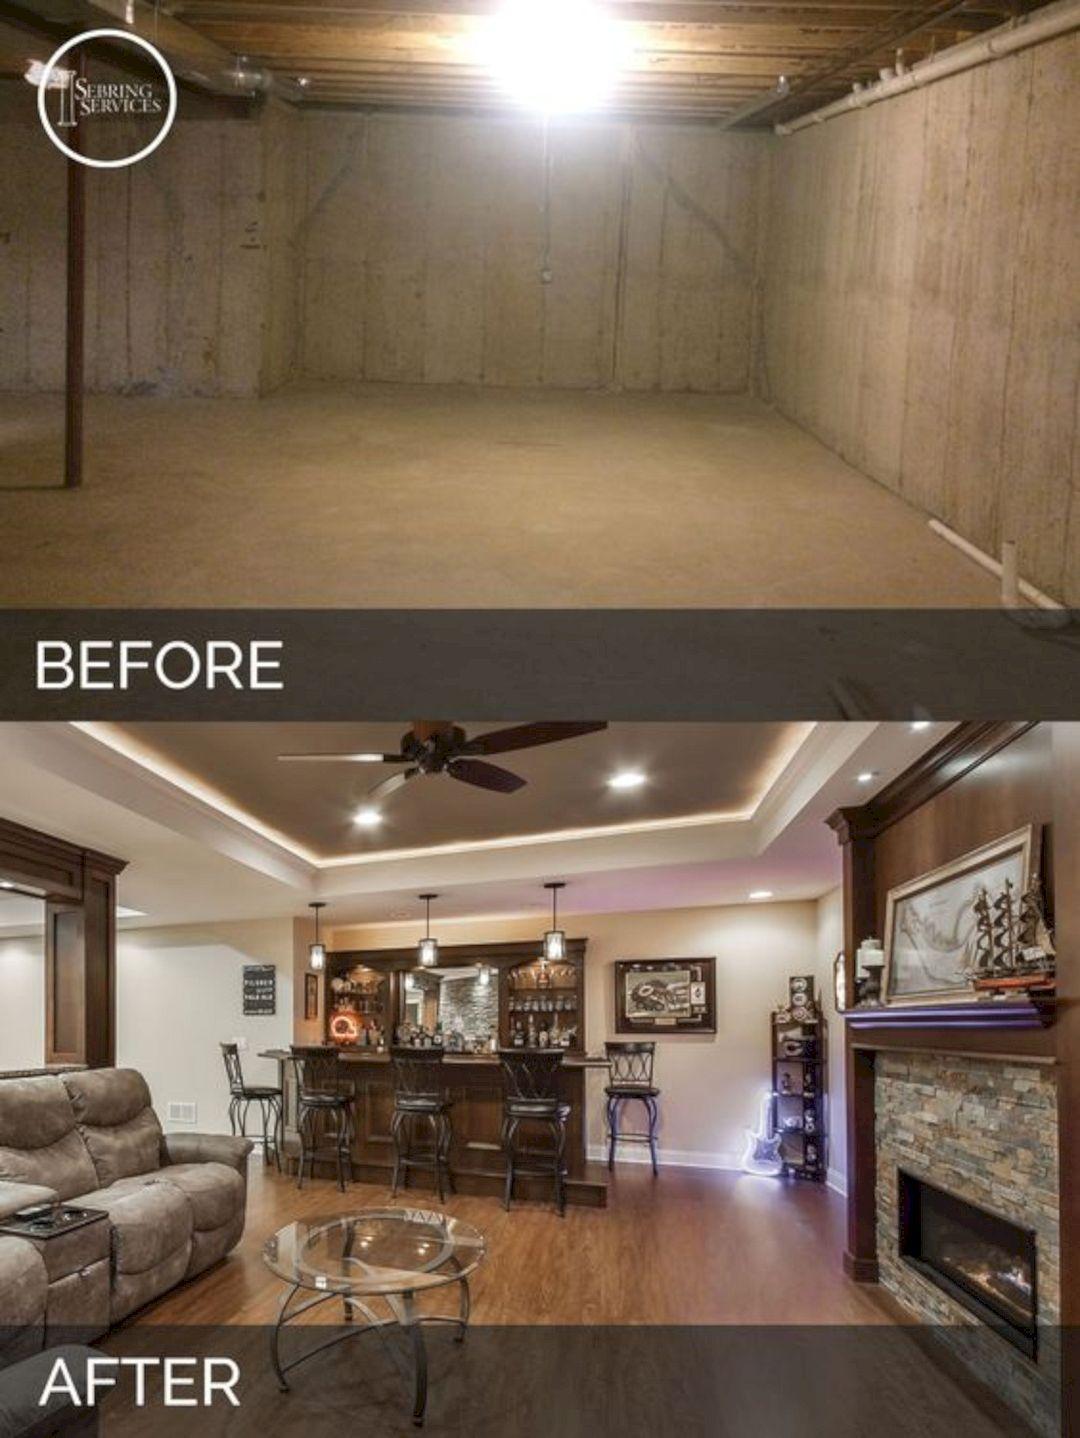 16 Creative Renovation Ideas To Enhance Your Basement Basement Makeover Basement Remodeling Finishing Basement